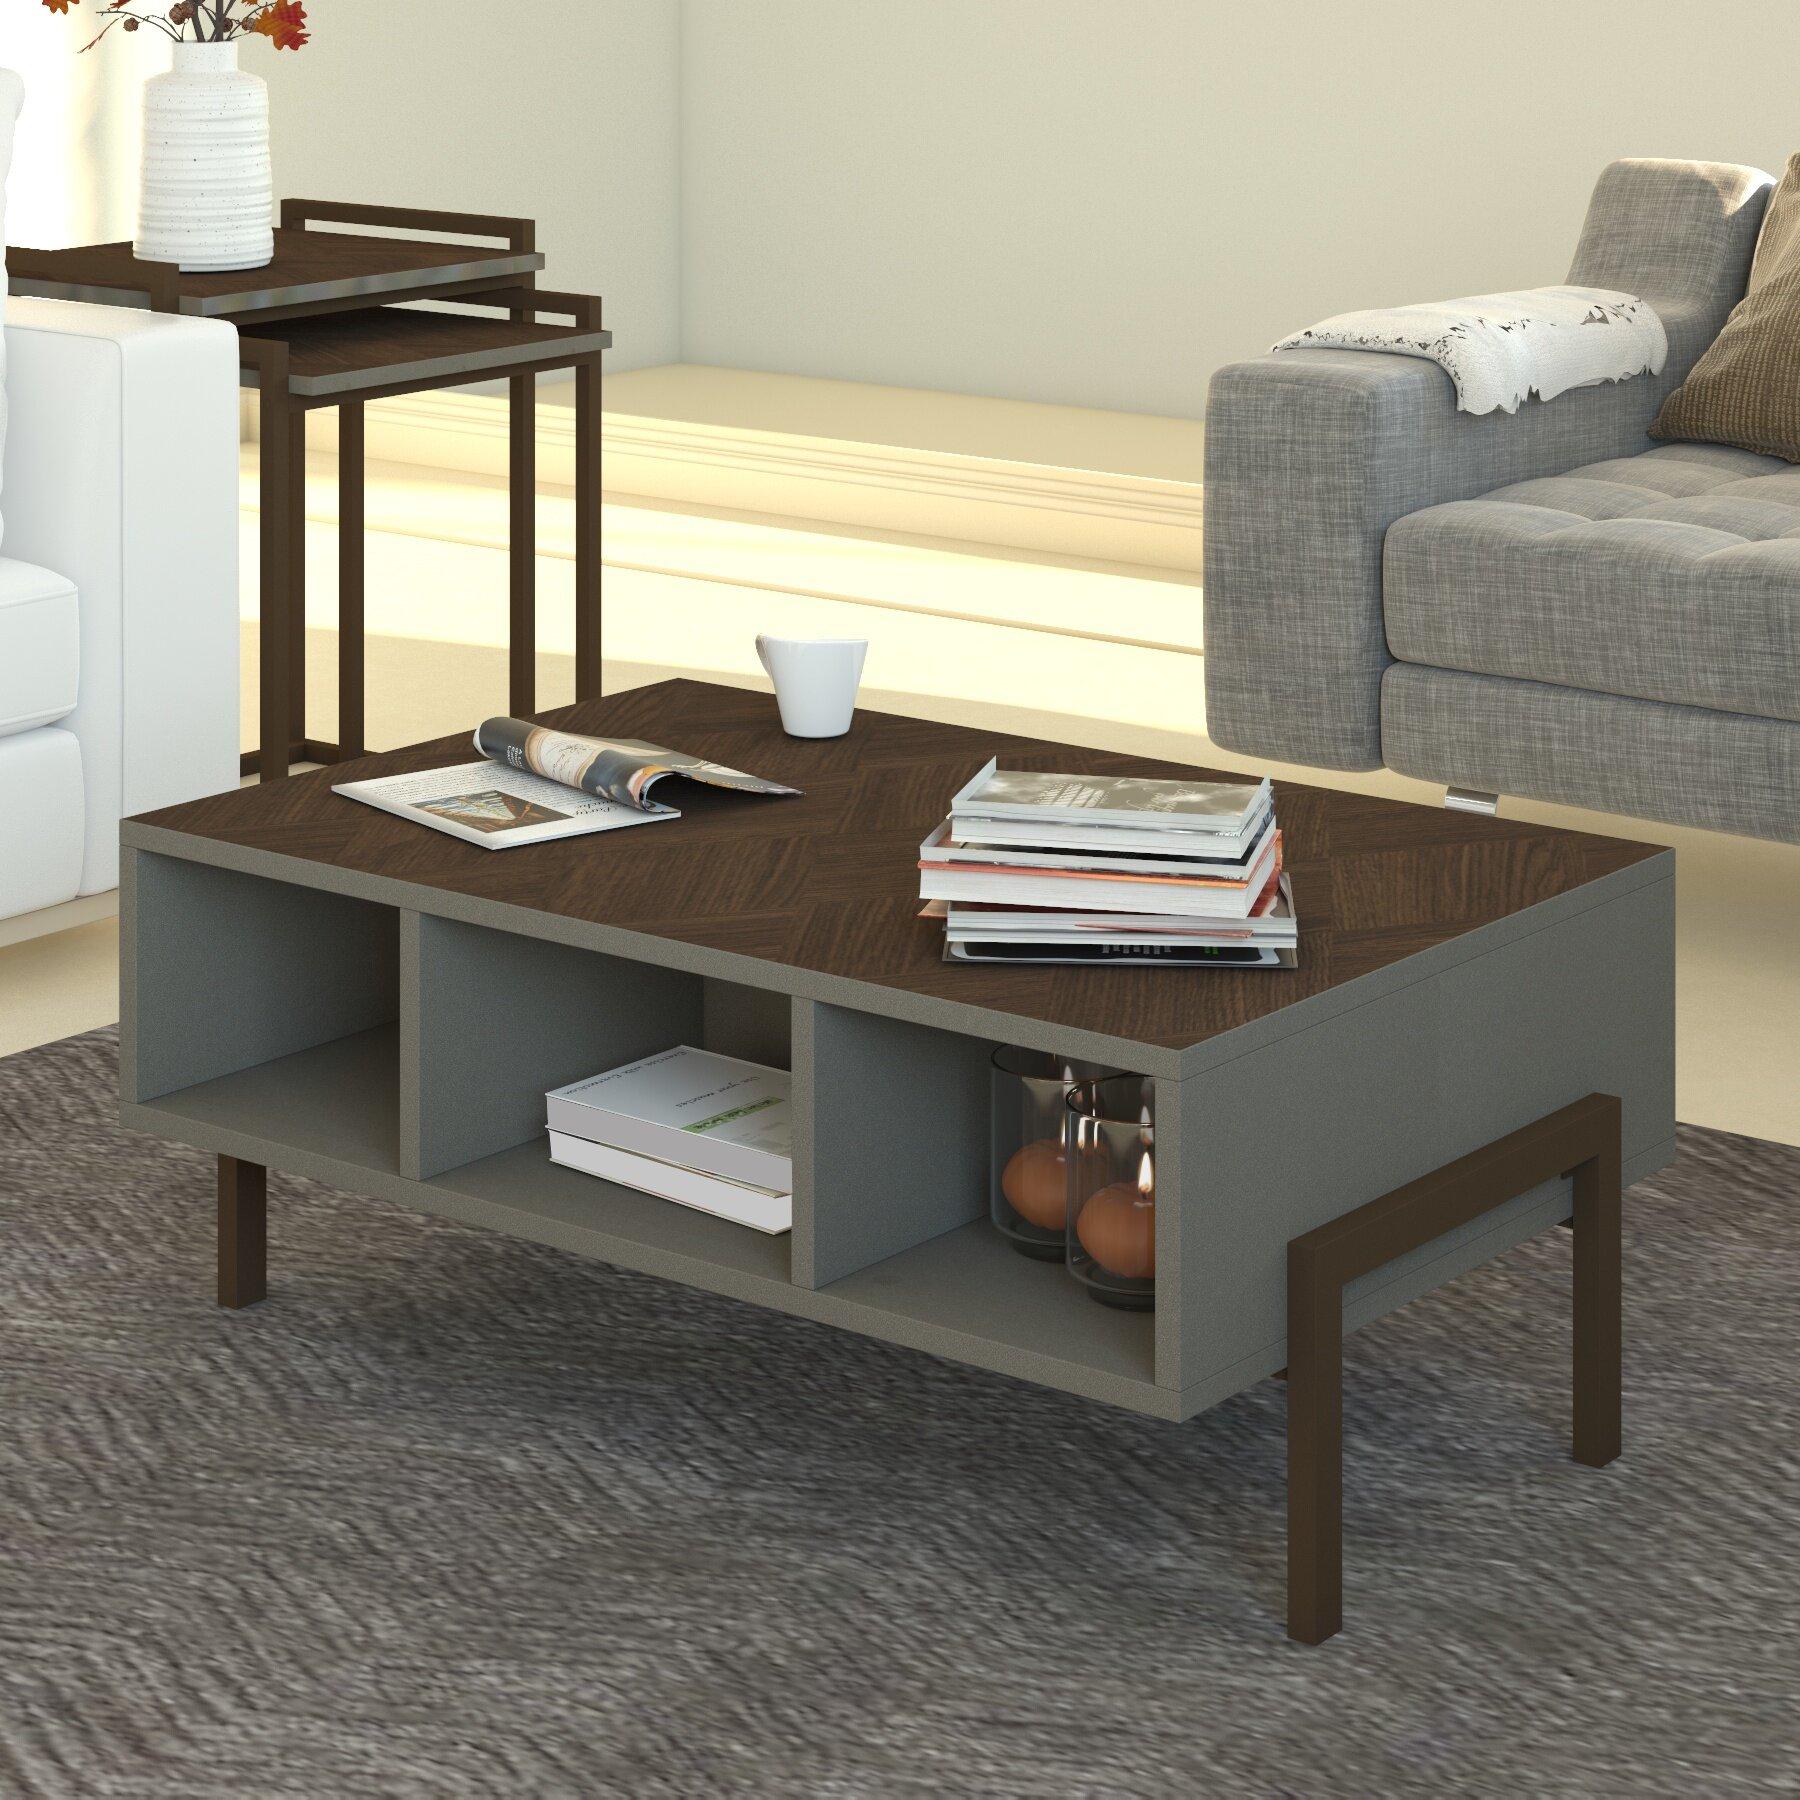 Ebern Designs Woodcock 3 Piece Coffee Table Set Reviews Wayfair